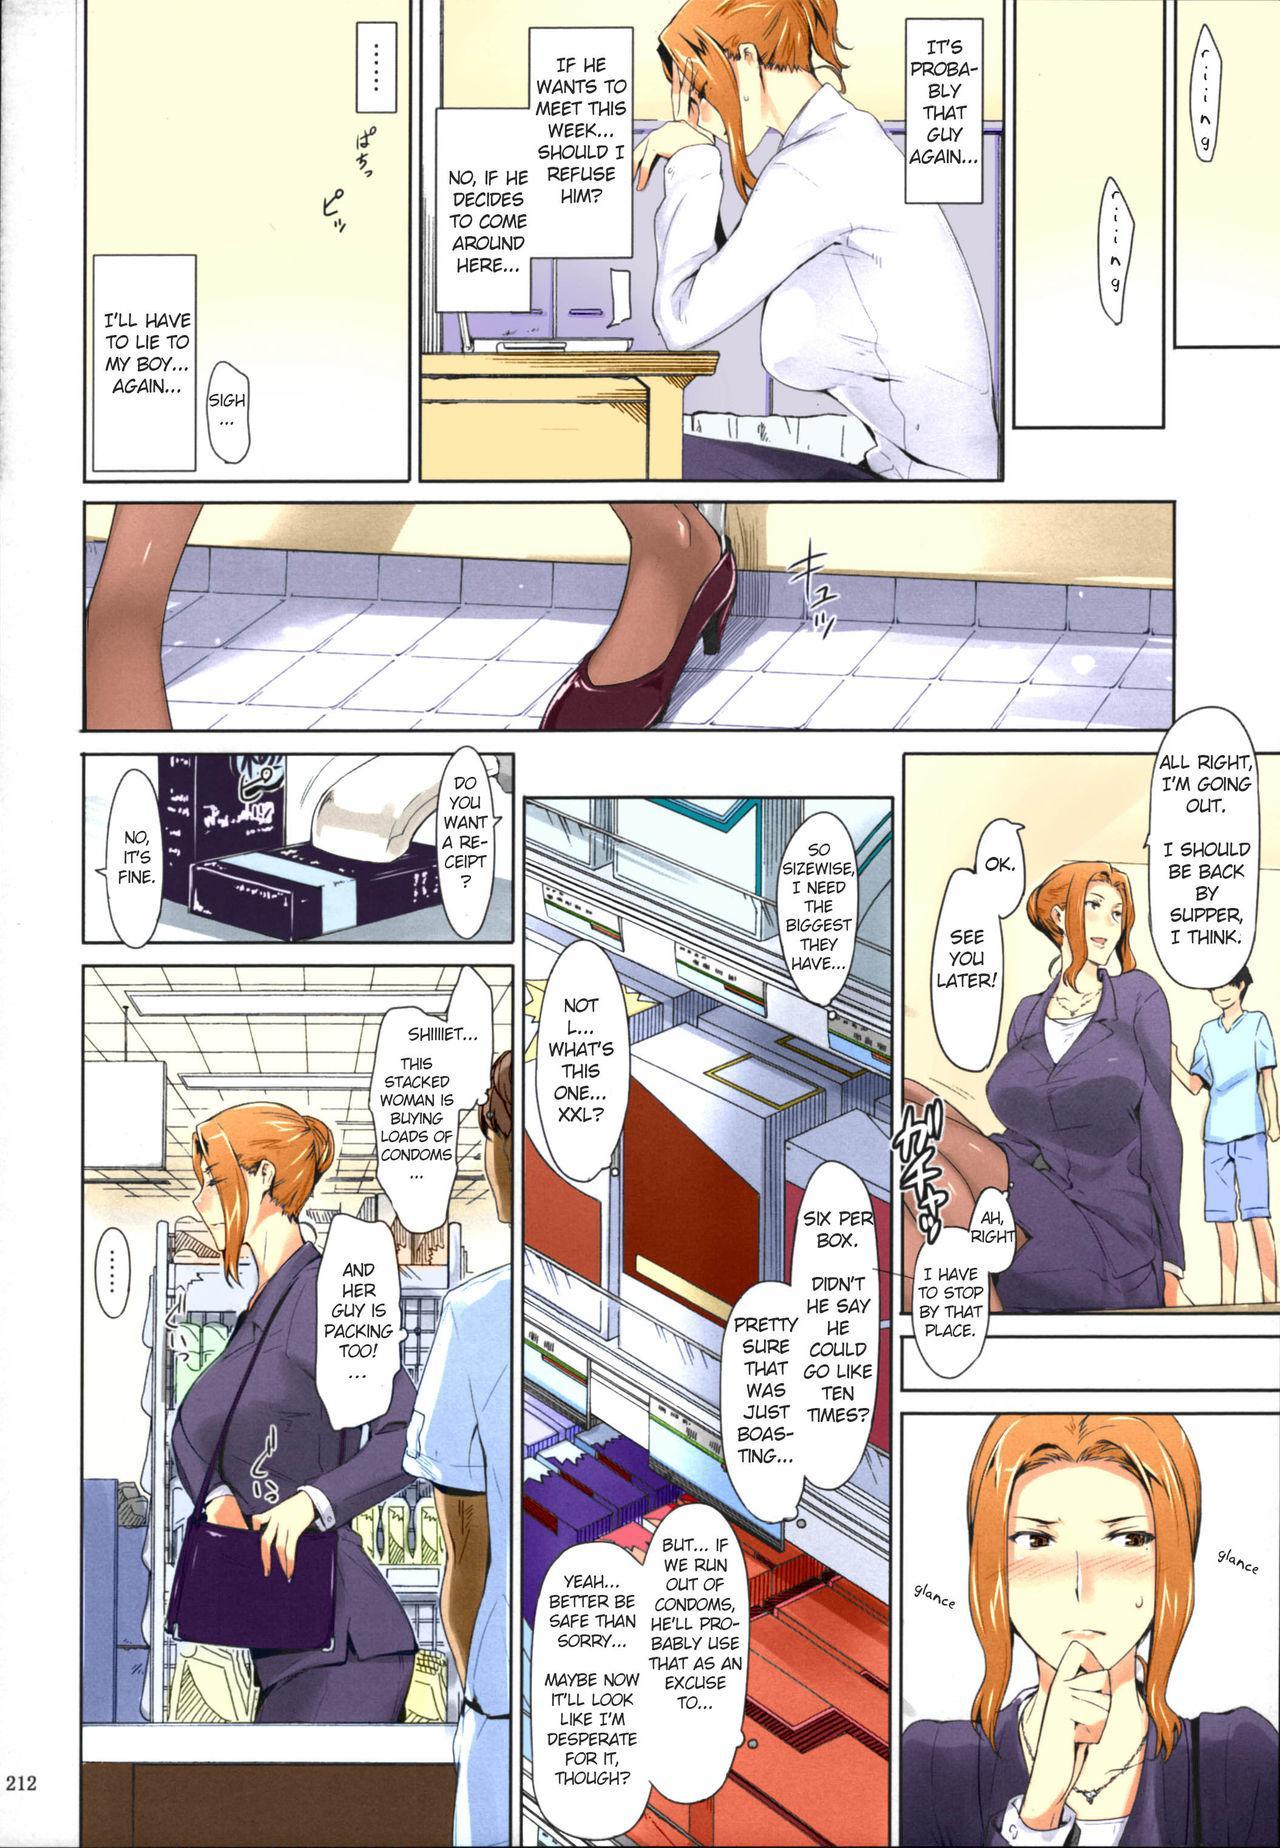 (C86) [MTSP (Jin)] Tachibana-san-chi no Dansei Jijou Matome Ban [English] [Colorized] 209